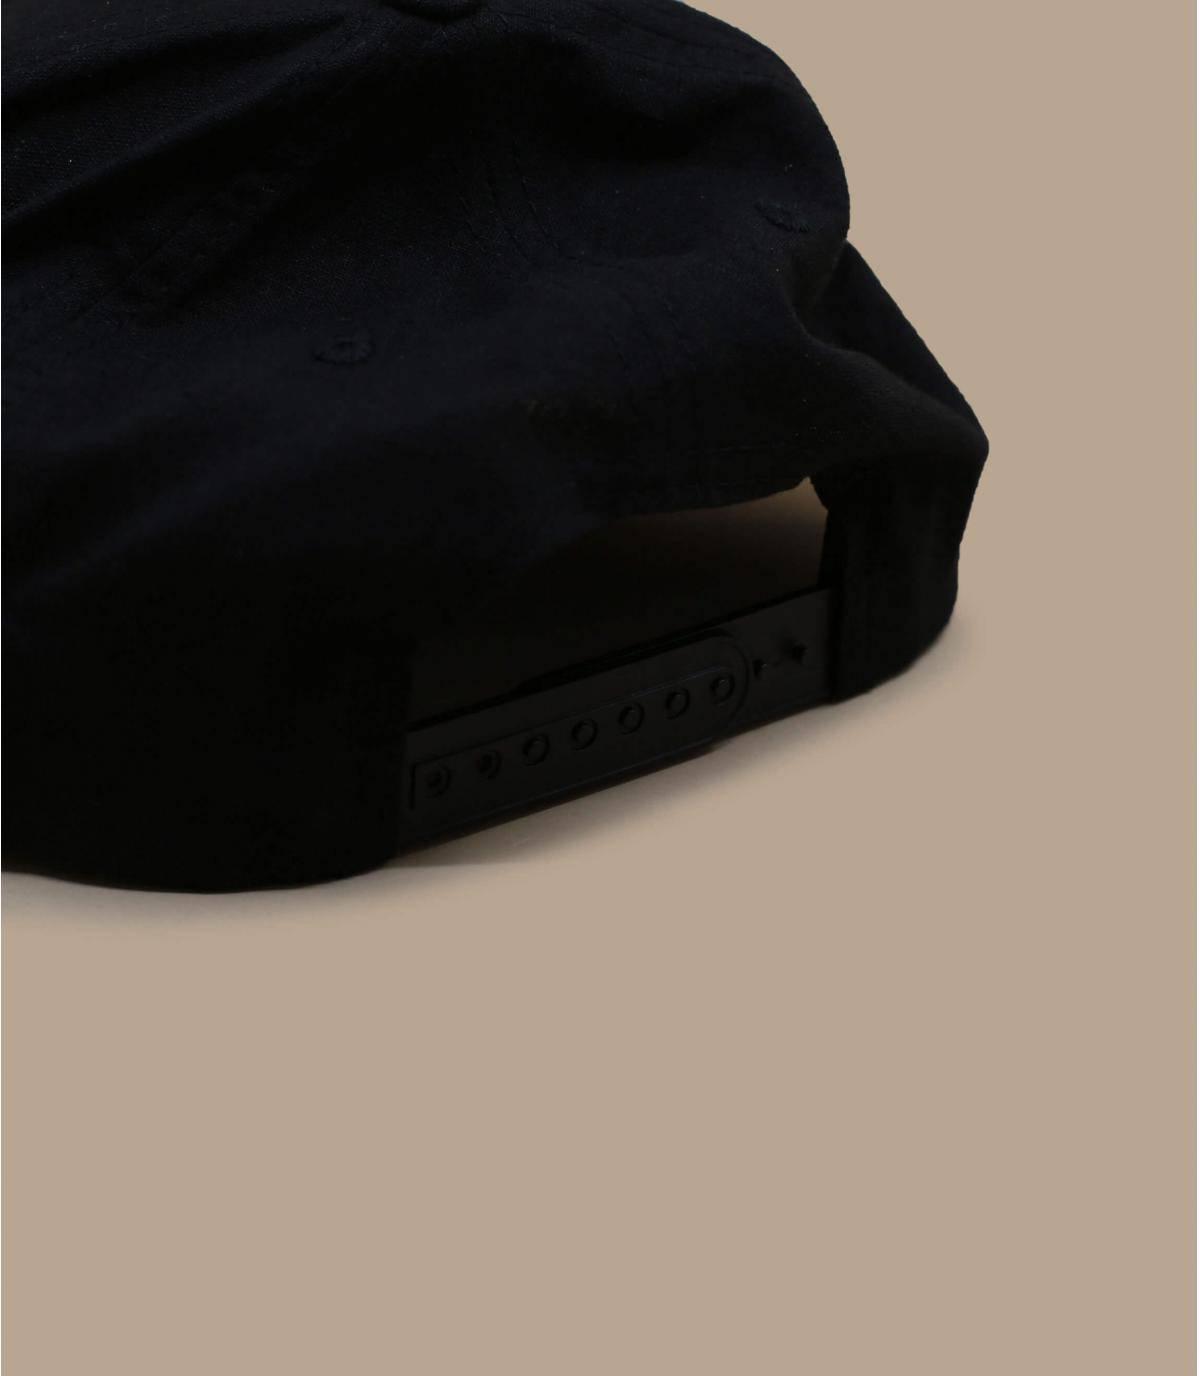 Dettagli New Wave black - image 4